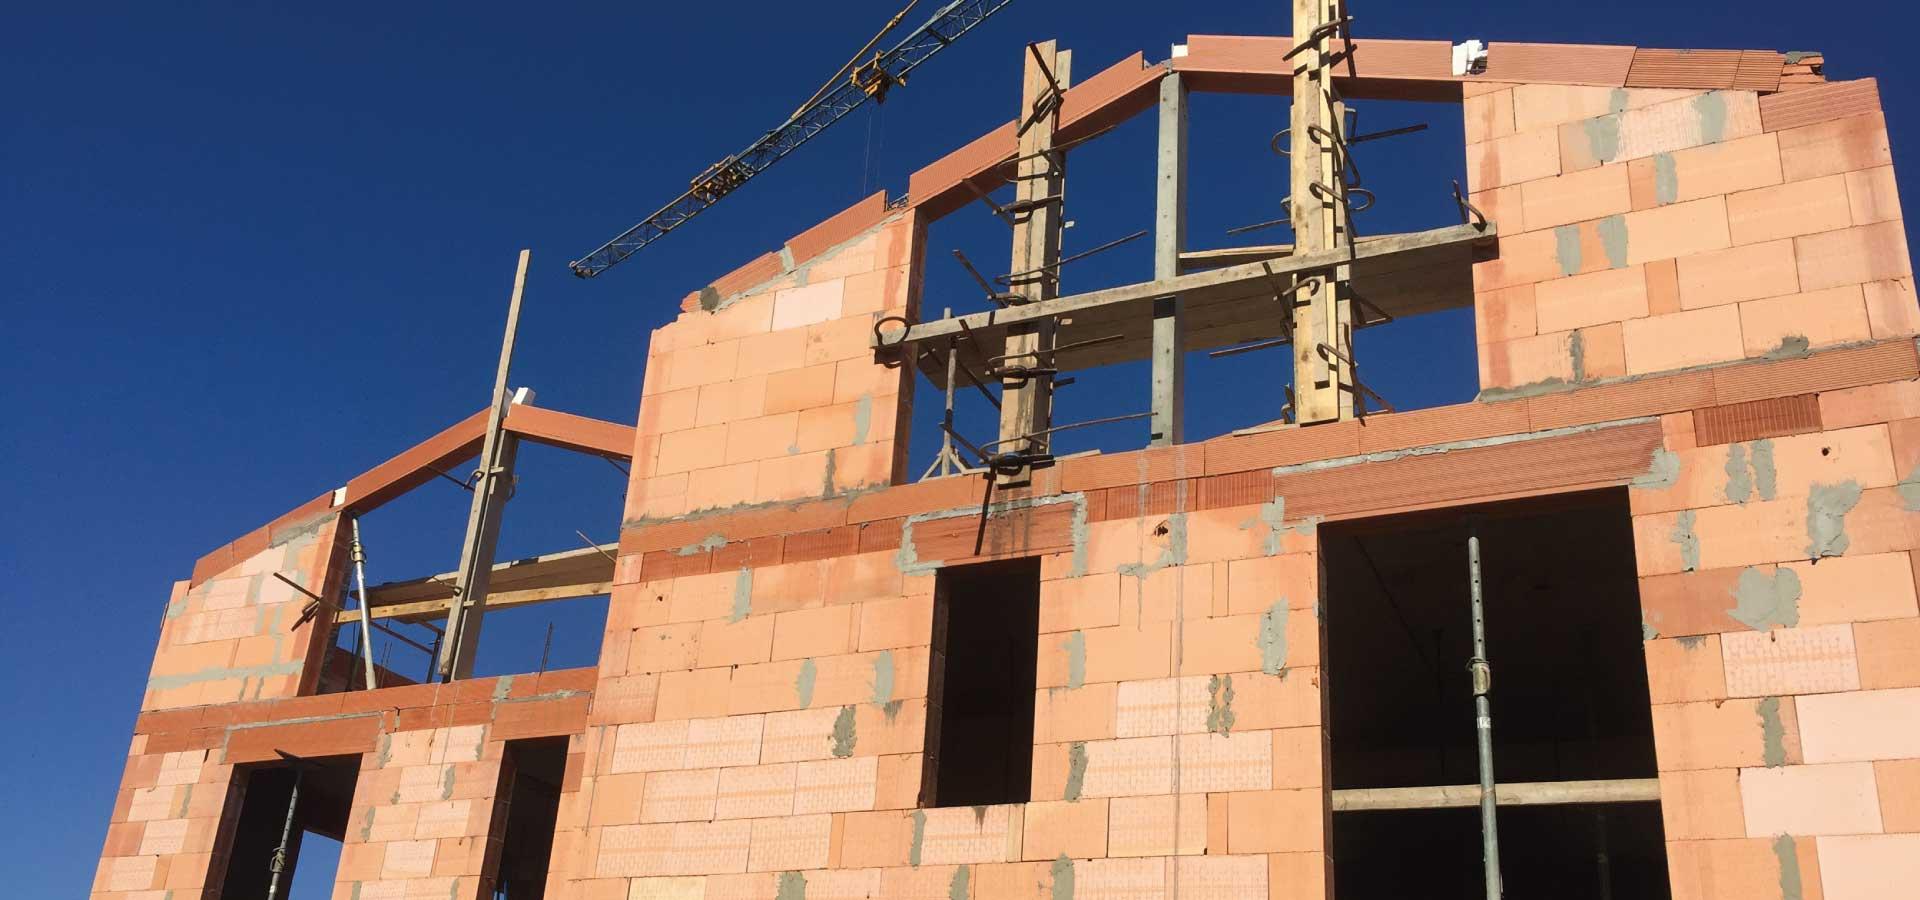 bakea-grue-transportable-rapide-construction-brique